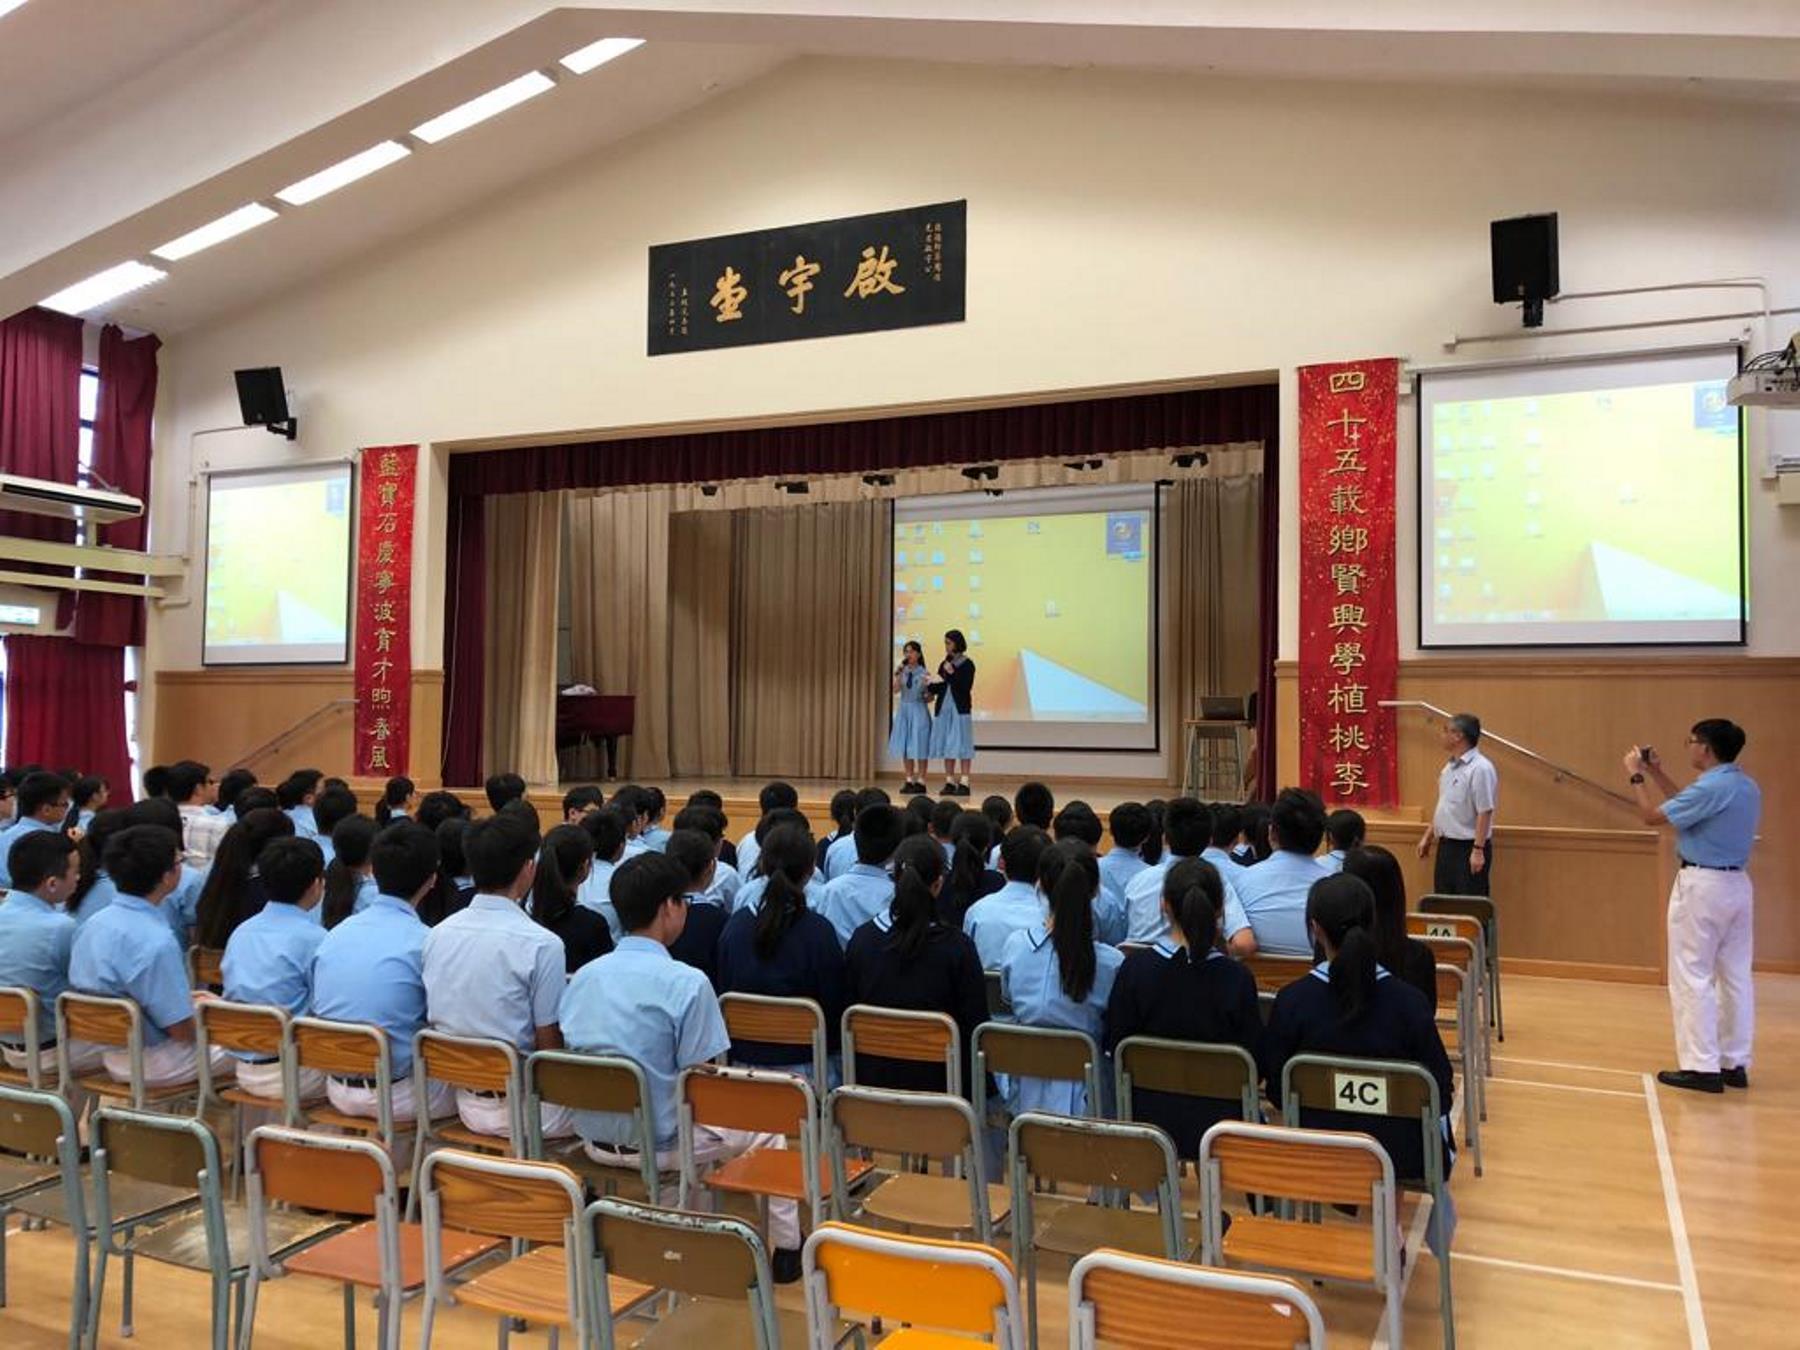 http://npc.edu.hk/sites/default/files/5_13.jpeg